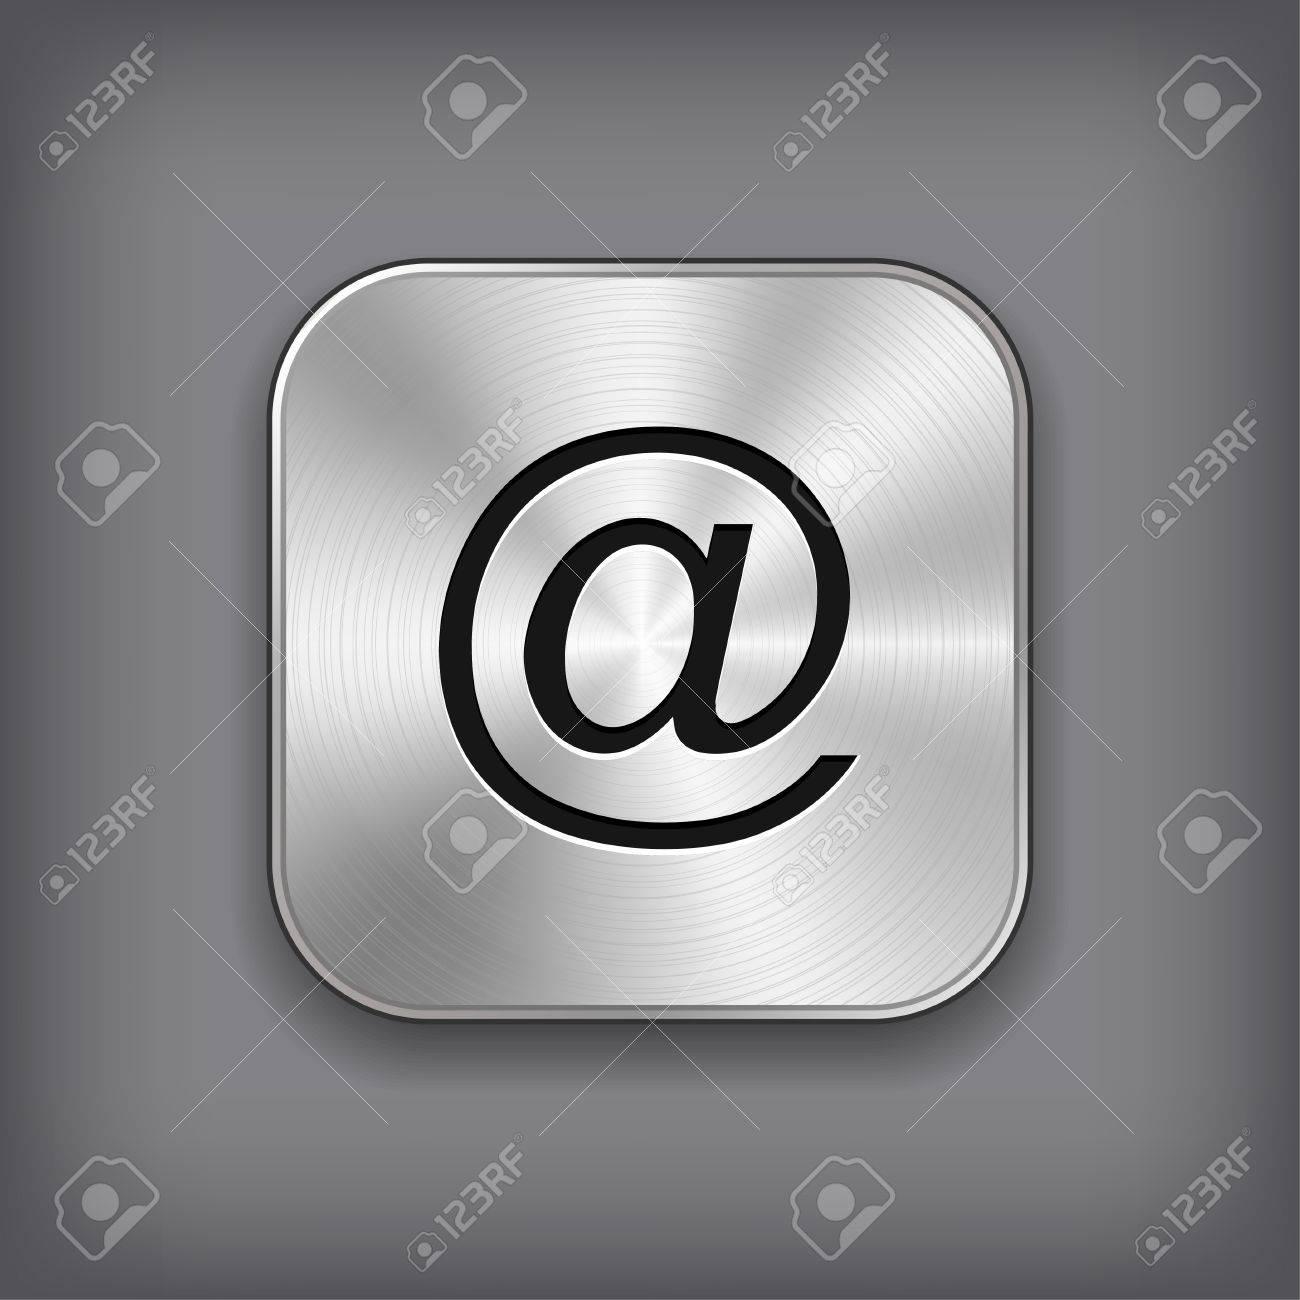 Mail icon - vector metal app button Stock Vector - 18226144